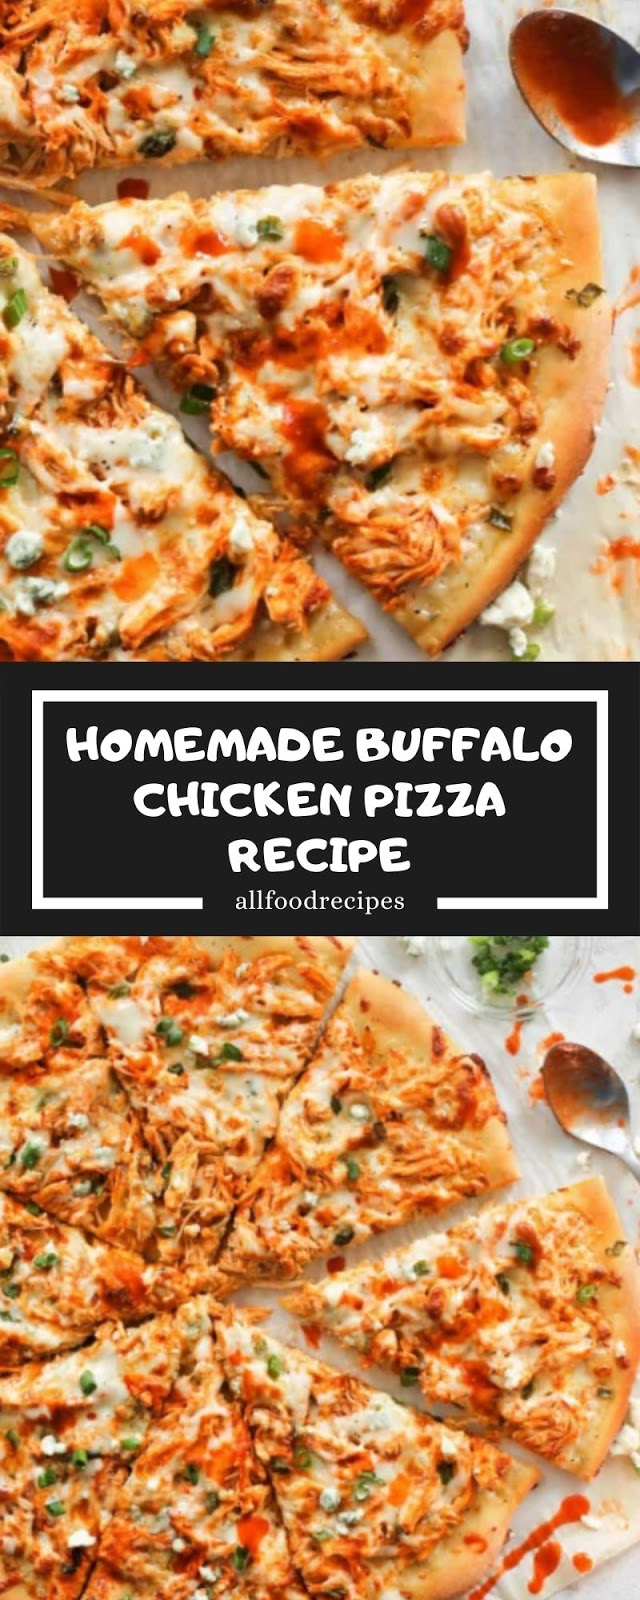 HOMEMADE BUFFALO CHICKEN PIZZA RECIPE